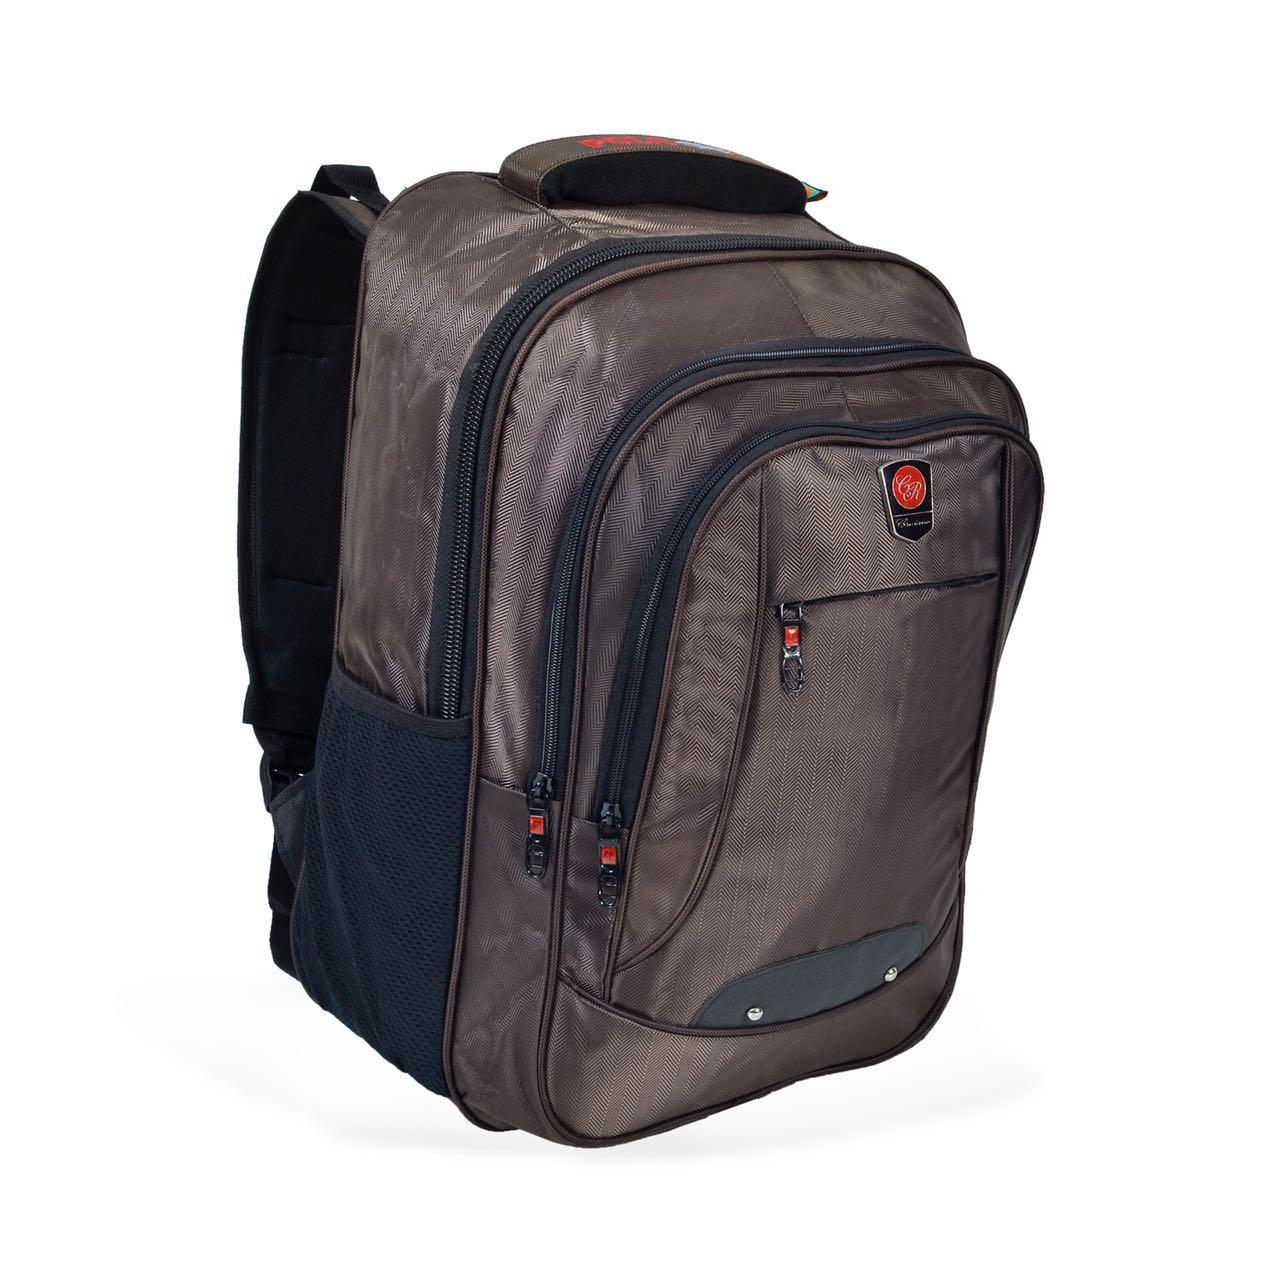 Polo Enter Backpack Tas Ransel Pria 18/ Inchi 4014 -18 ZV Coffee Polyester Nylon Original + Raincover